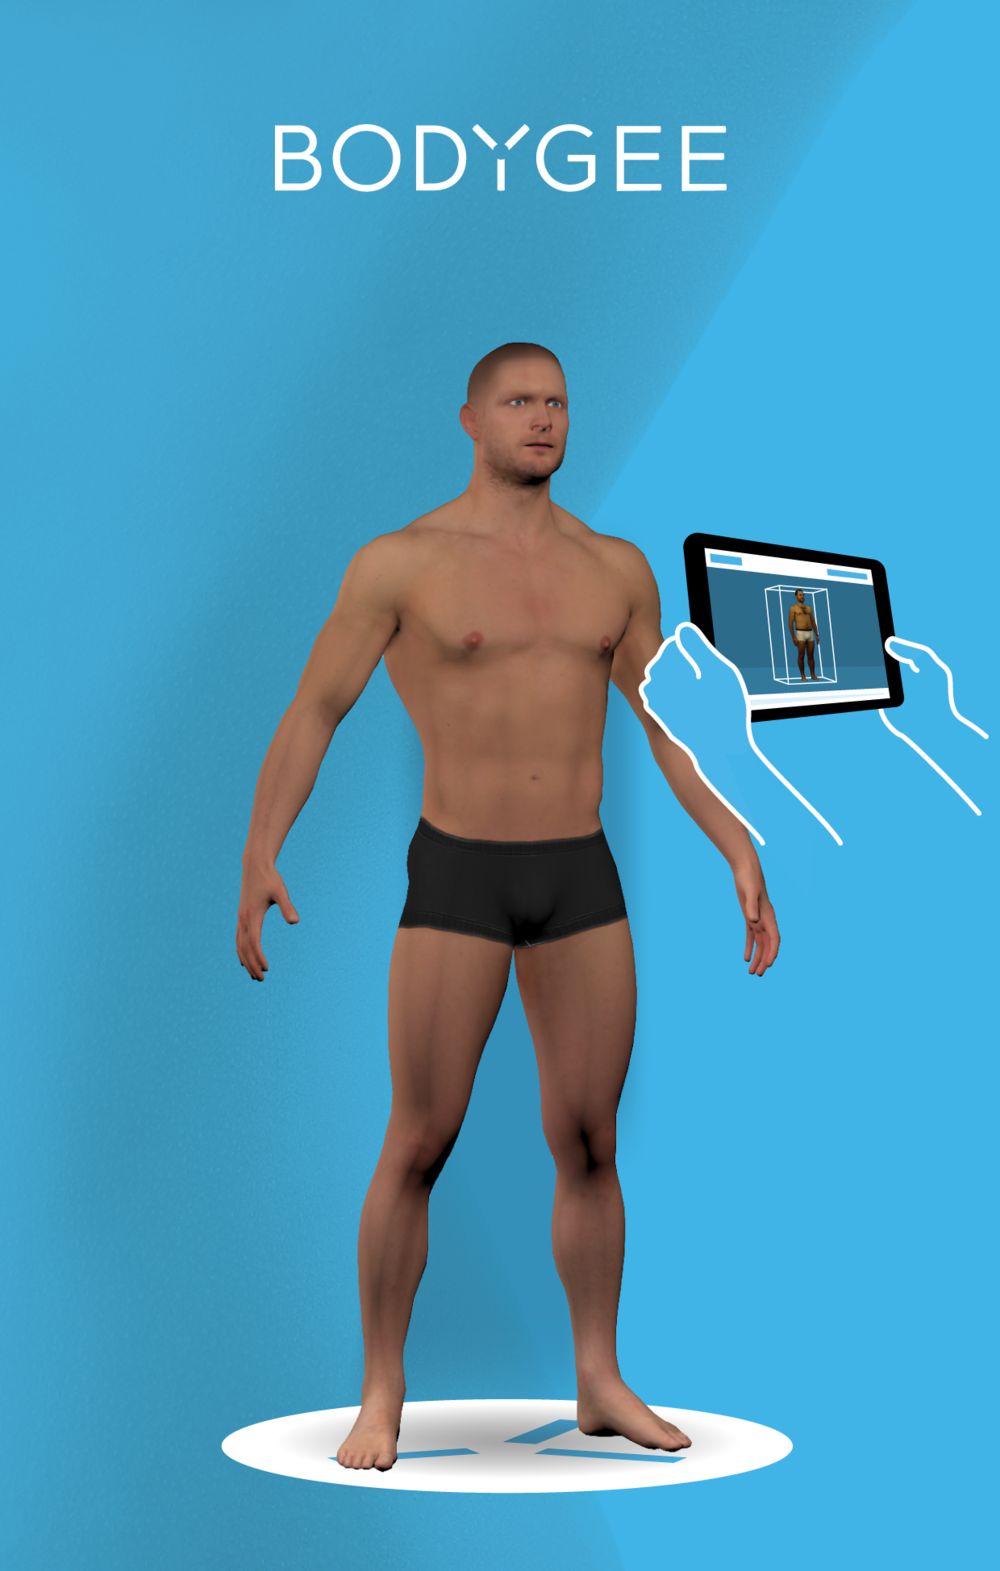 Bodygee-Funktionsgrafik-Body01-iOS-1.png